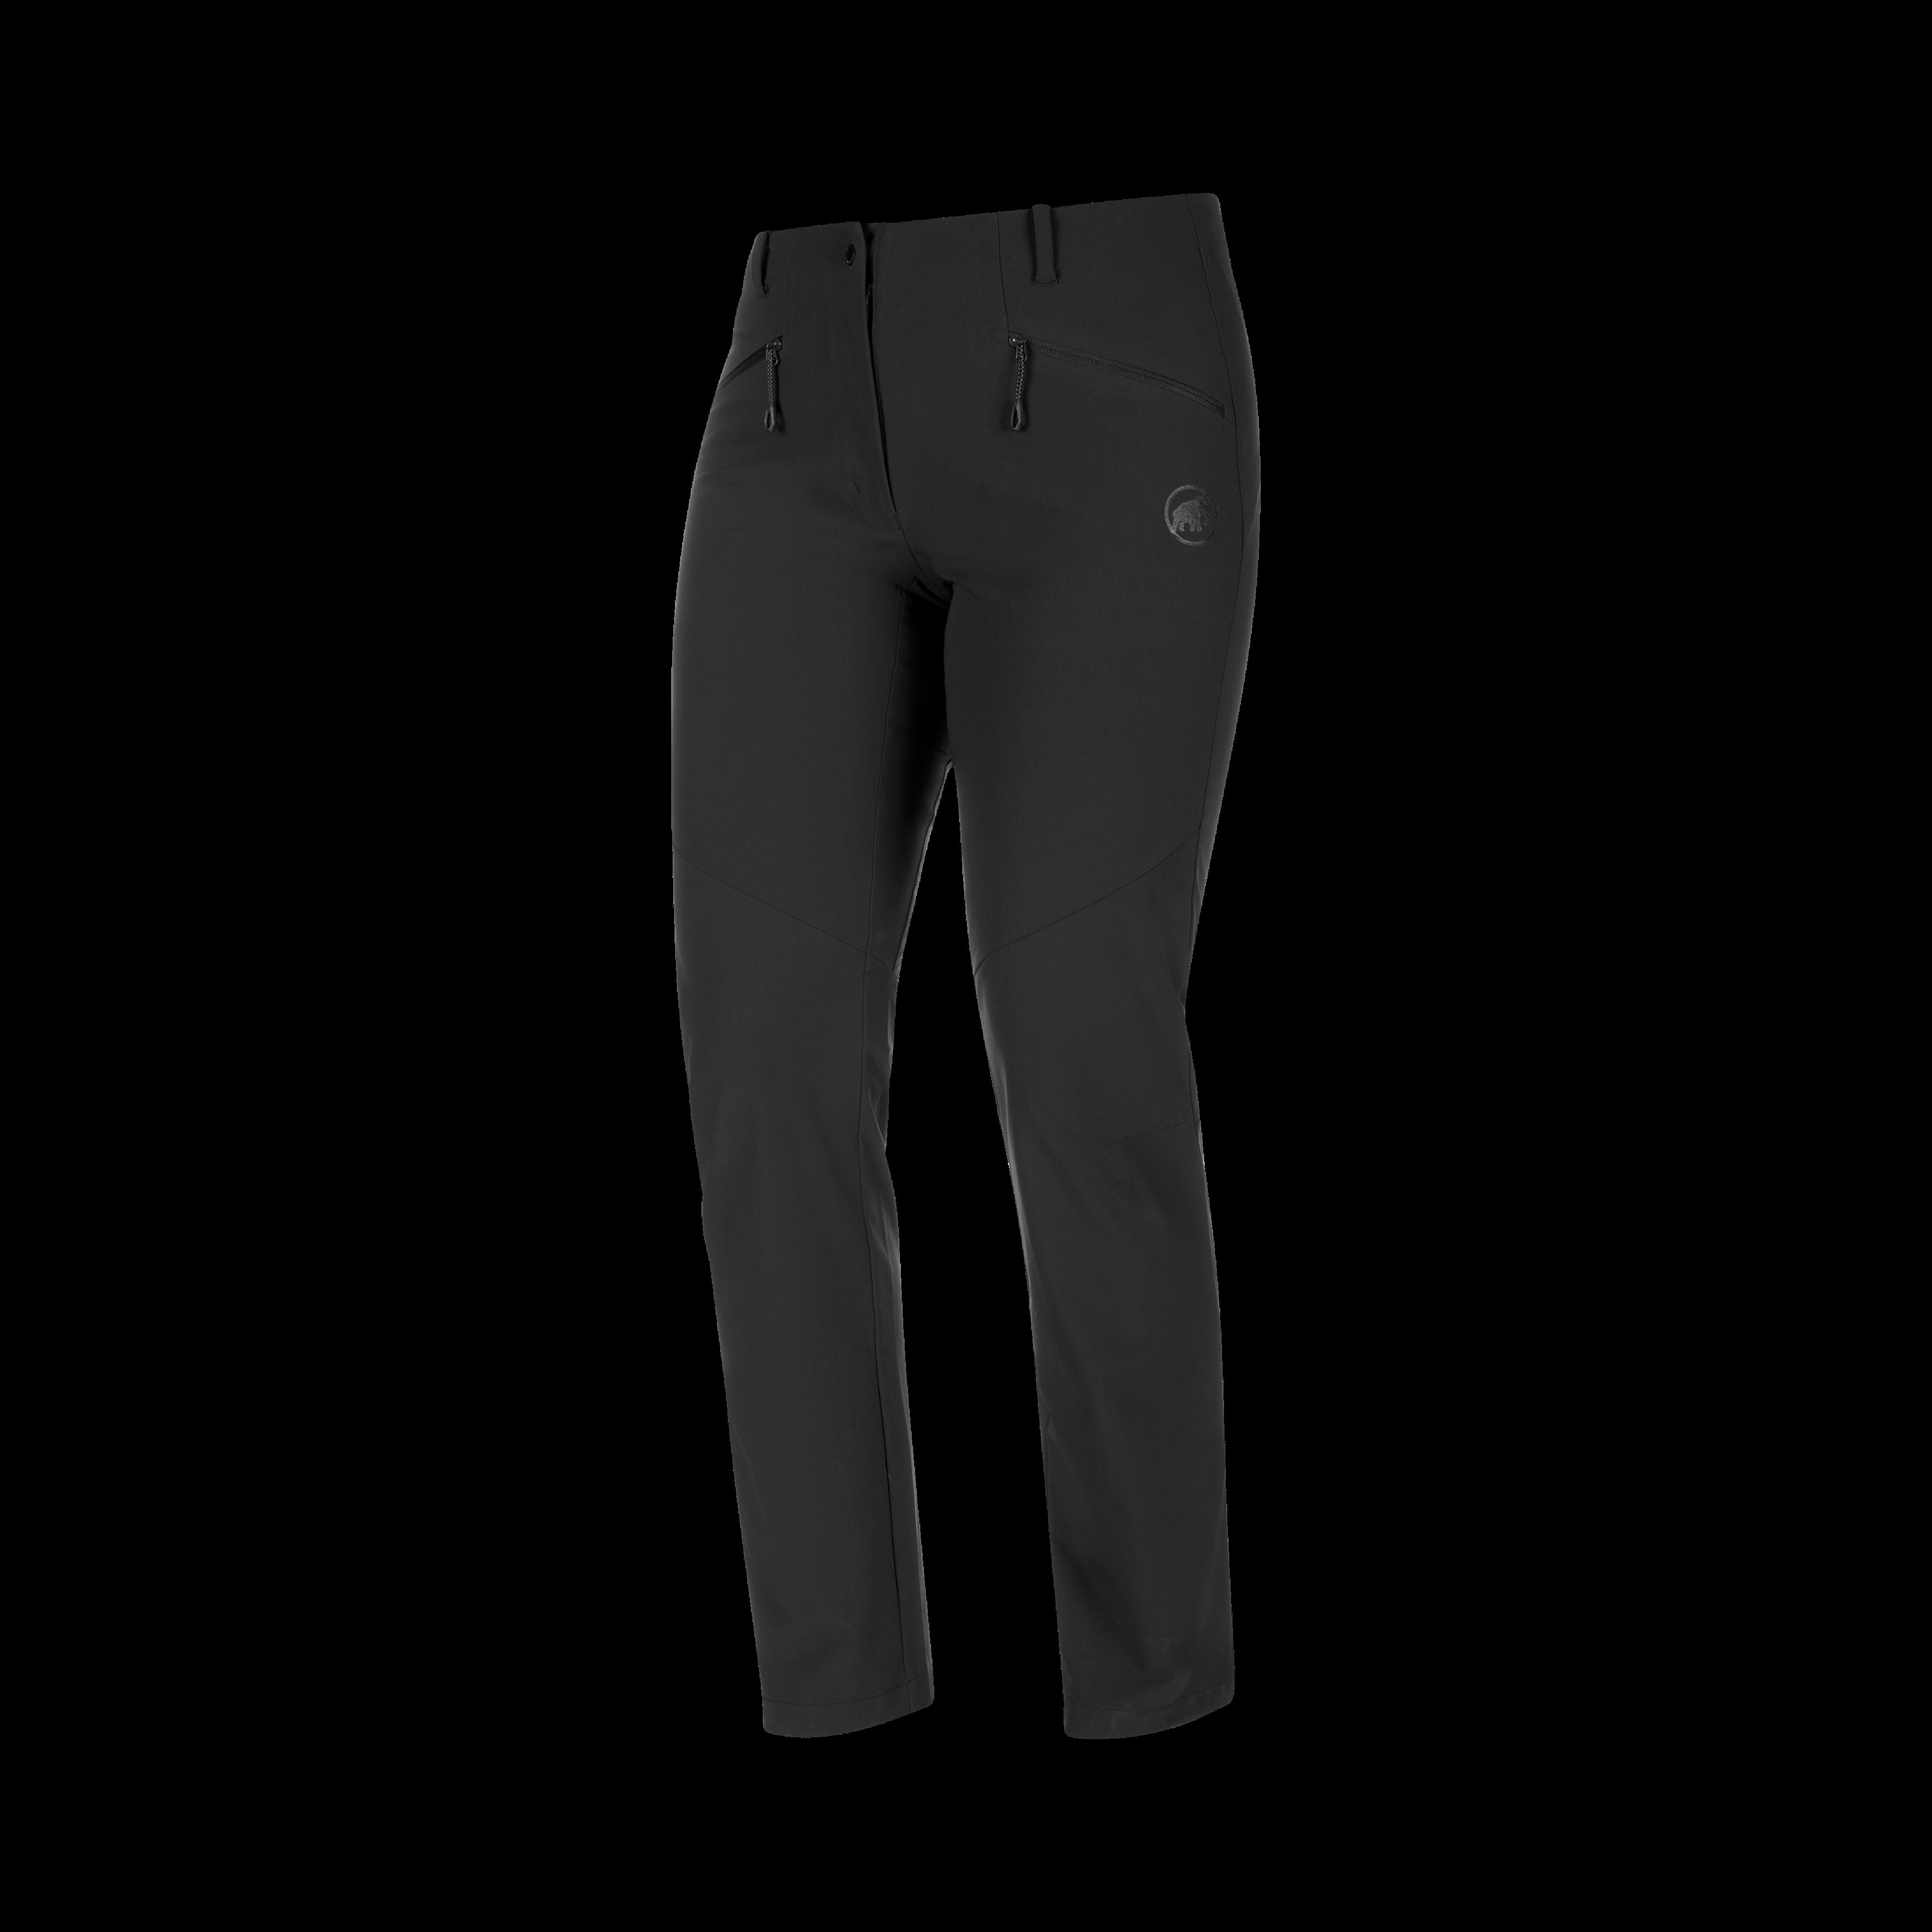 Macun SO Pants Women - black, long, UK 10 thumbnail